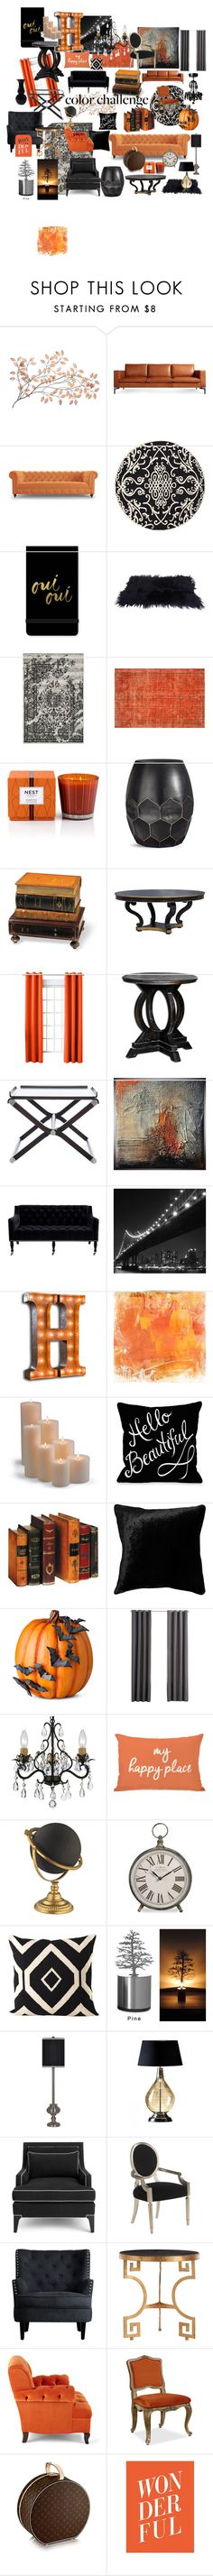 """LoveOrange&Black"" by dana-einck on Polyvore featuring interior, interiors, interior design, home, home decor, interior decorating, Blu Dot, Joybird, Safavieh and Fringe"